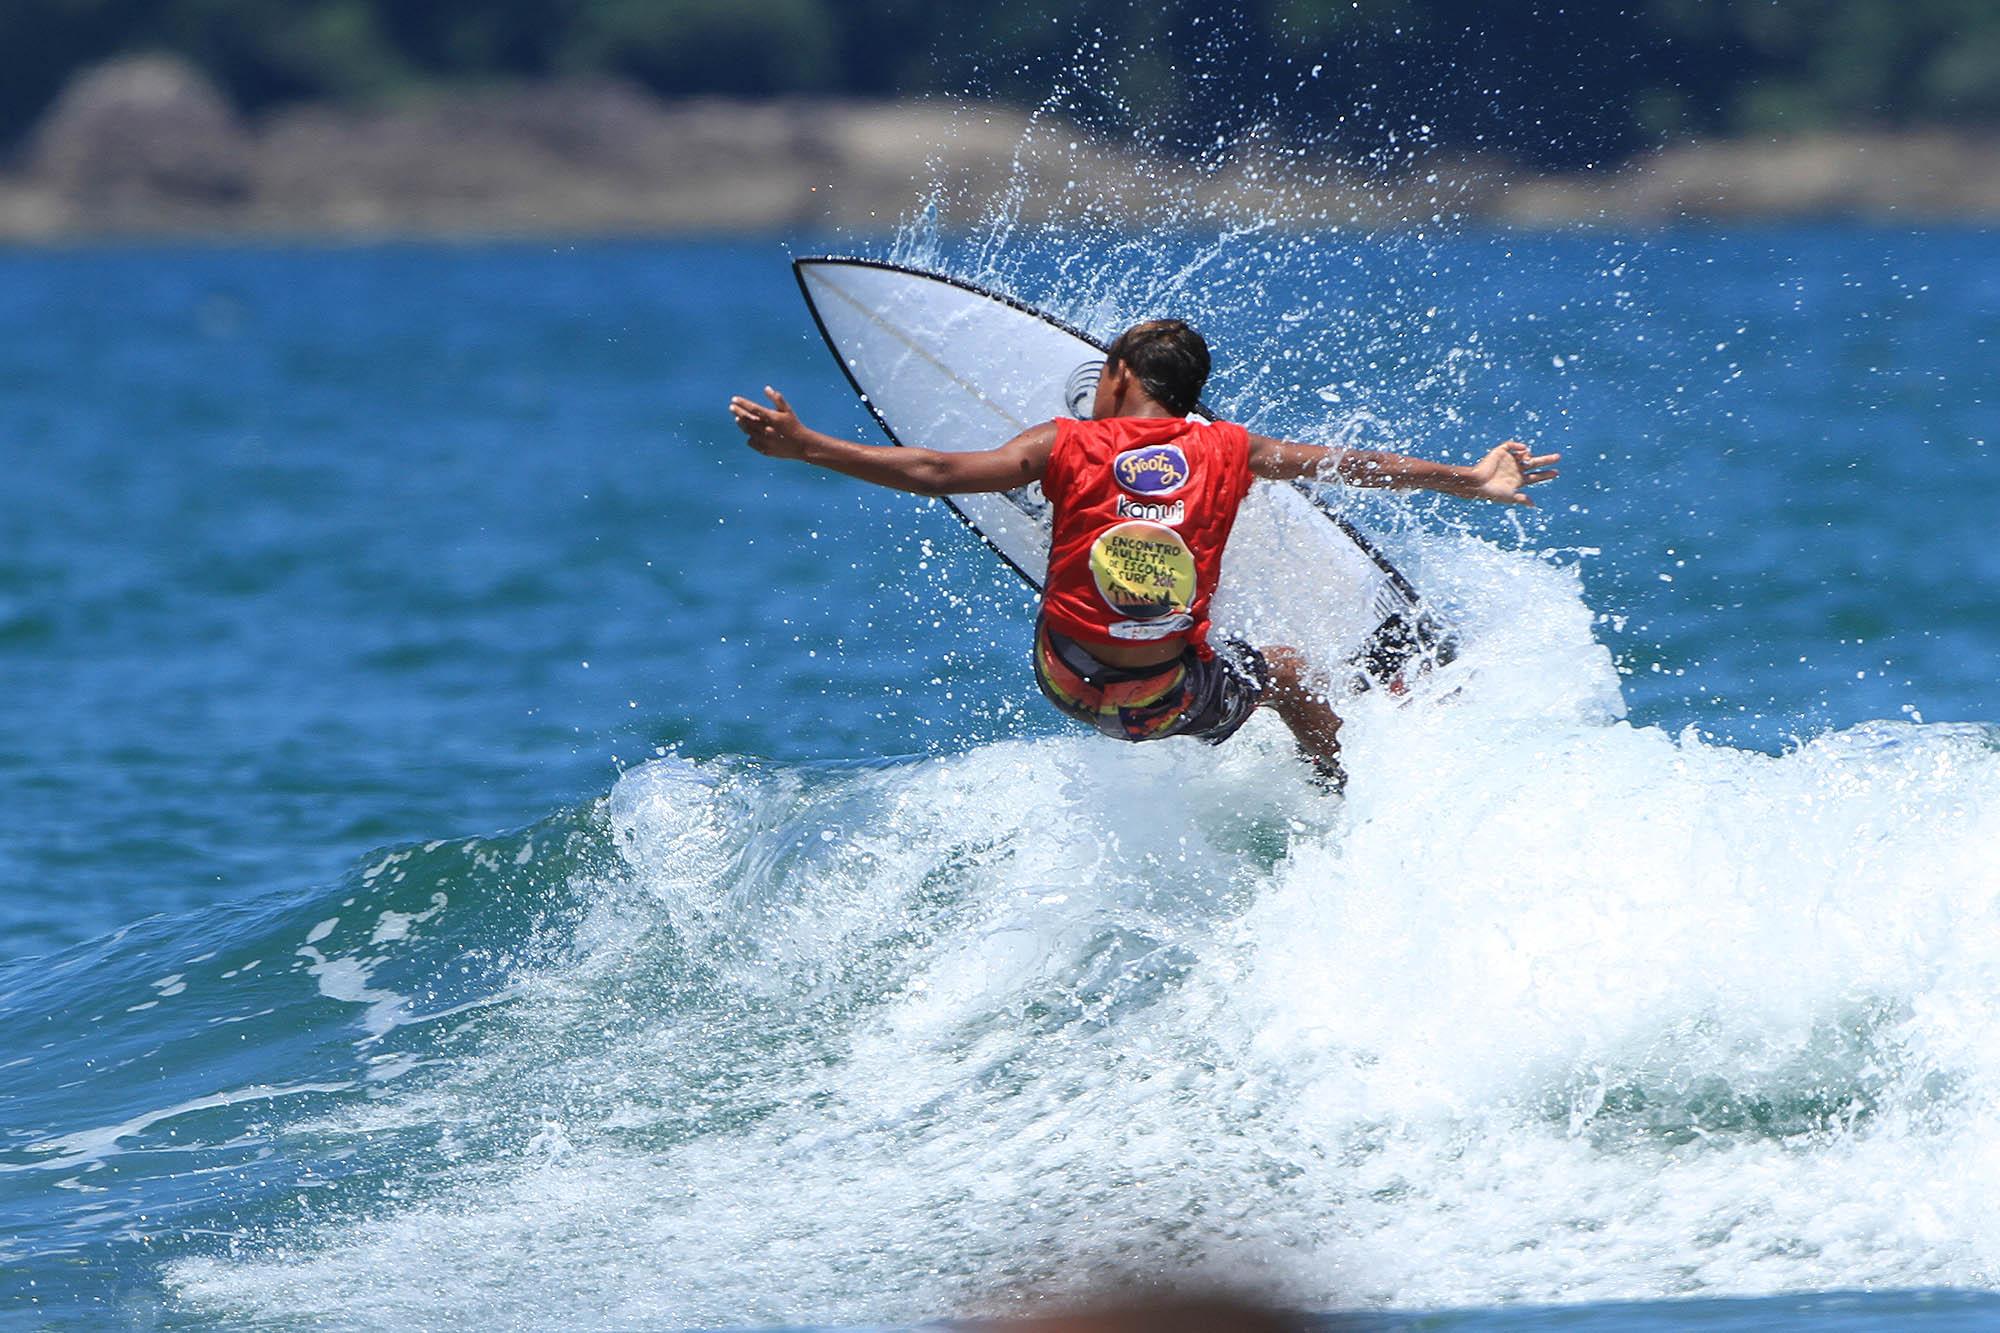 IGM 1 Encontro Paulista de Escolas de Surf Praia da Baleia Foto Munir El Hage1